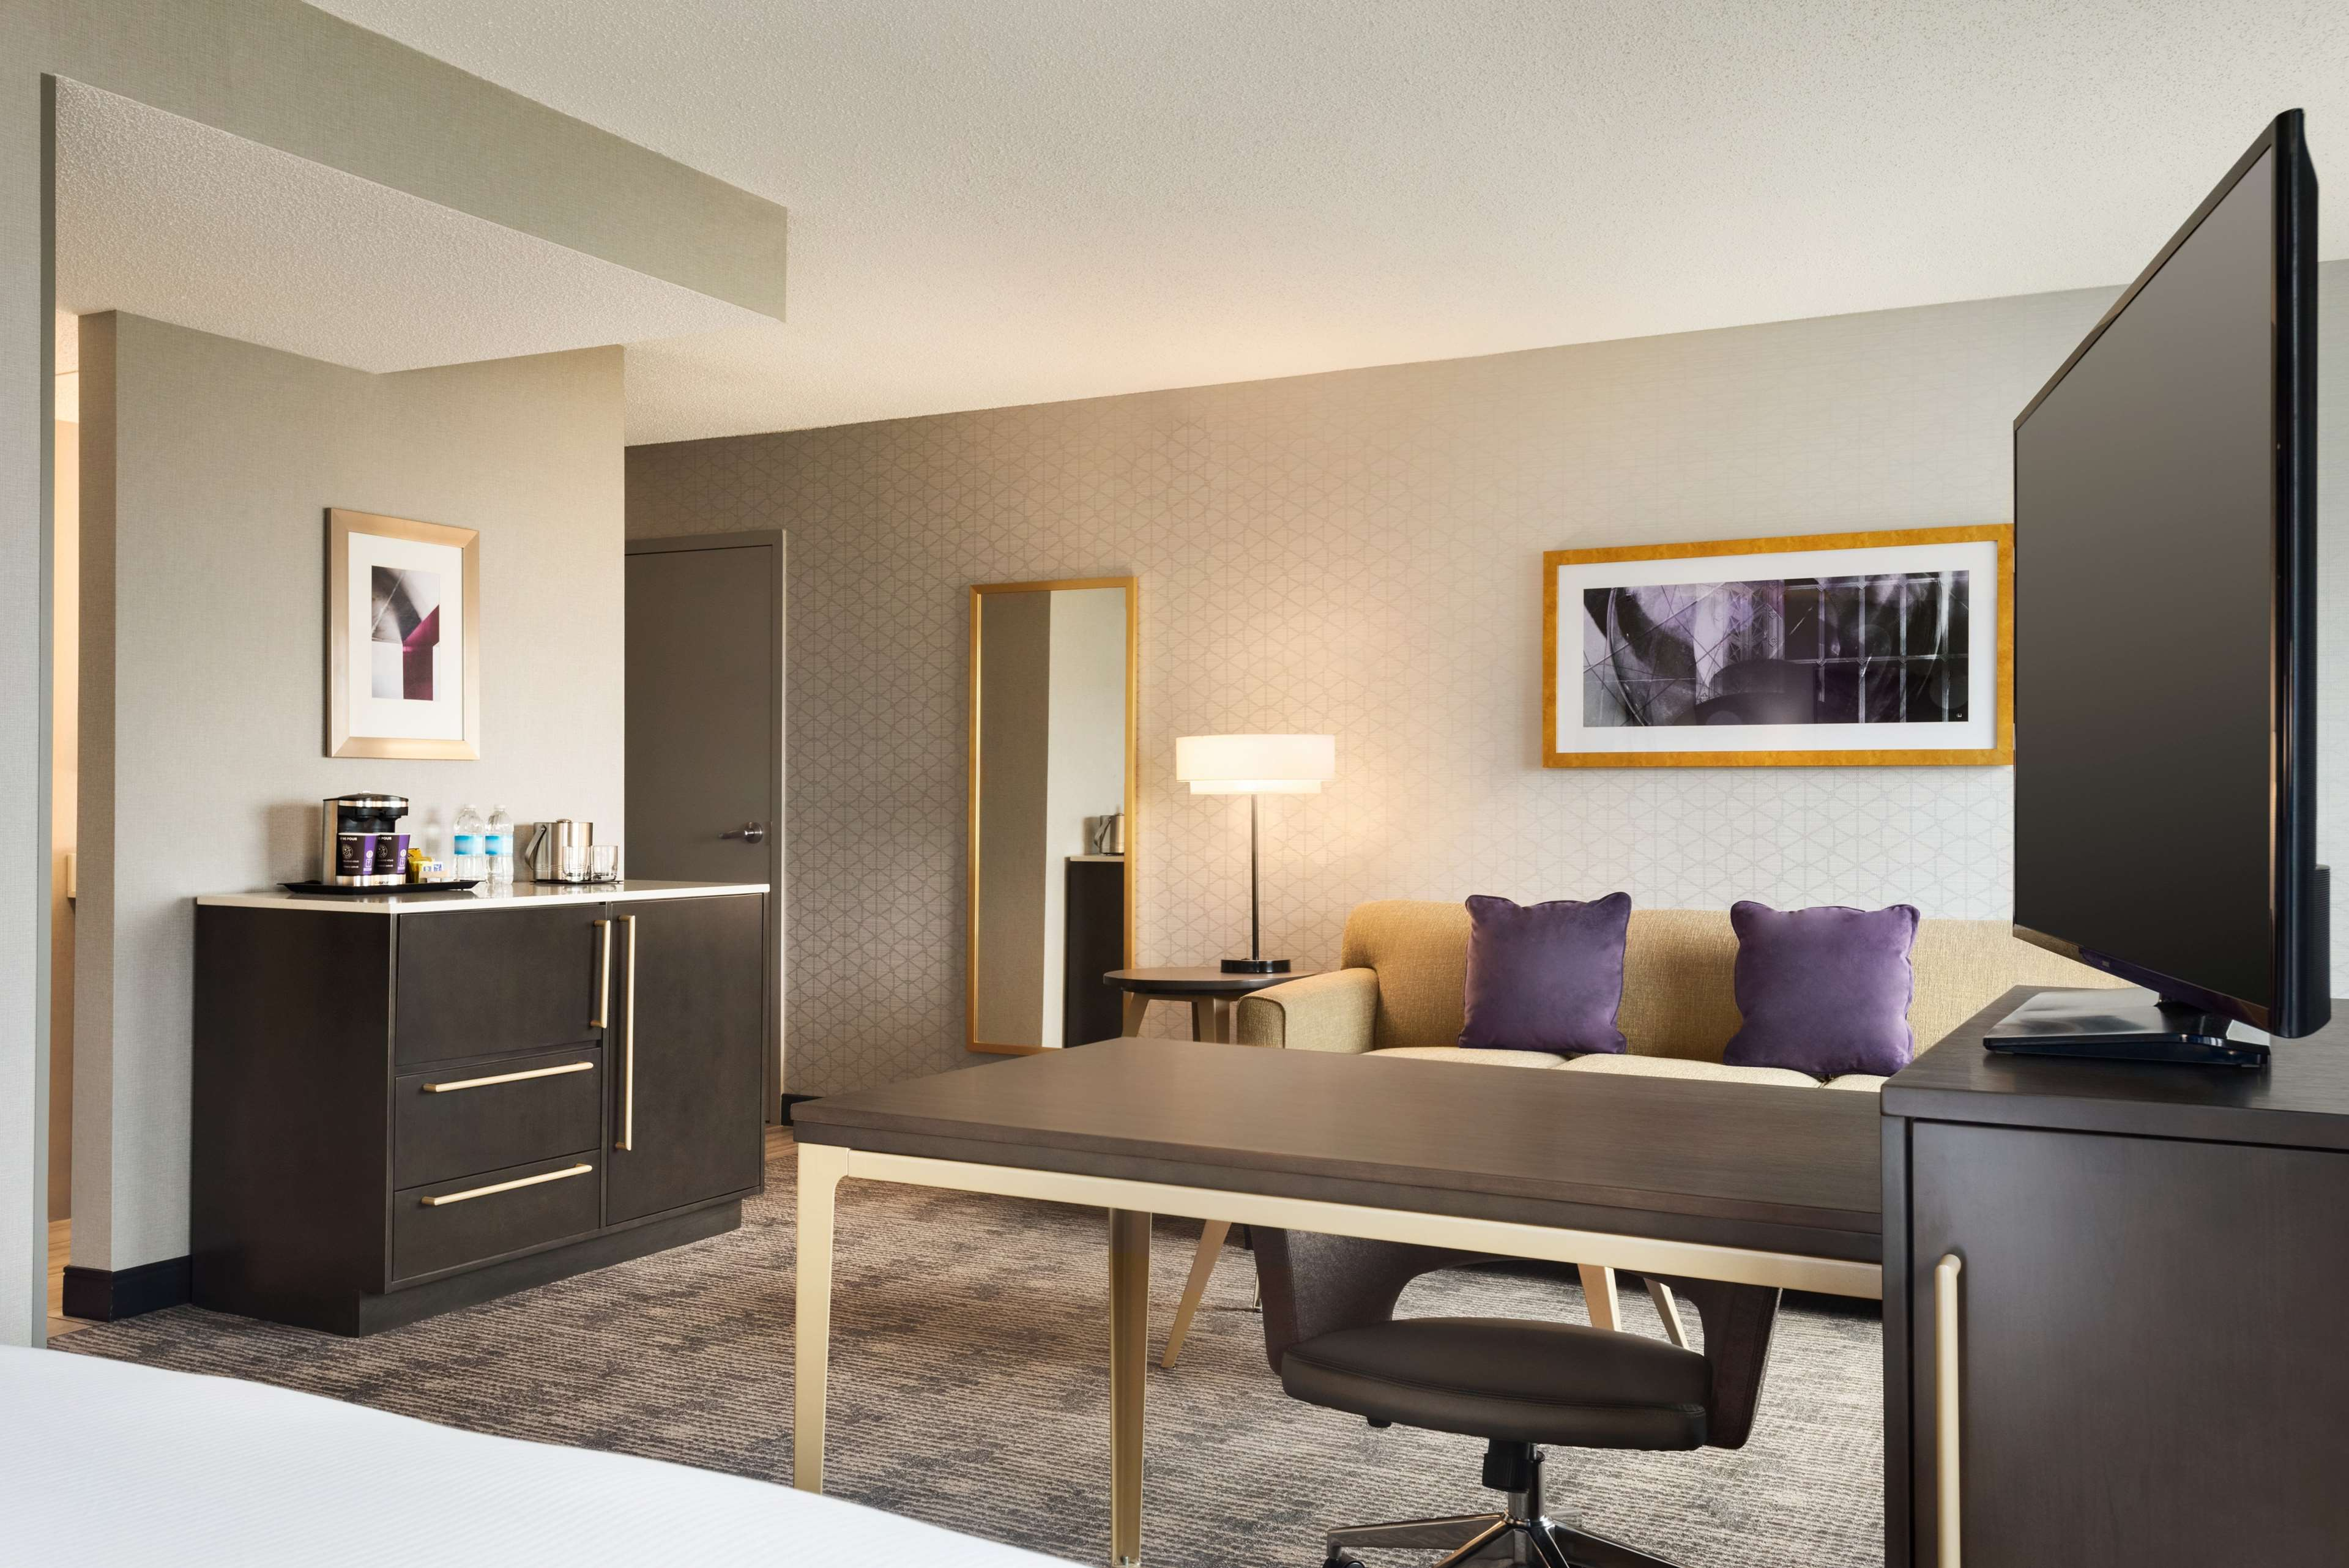 DoubleTree by Hilton St. Paul East image 18